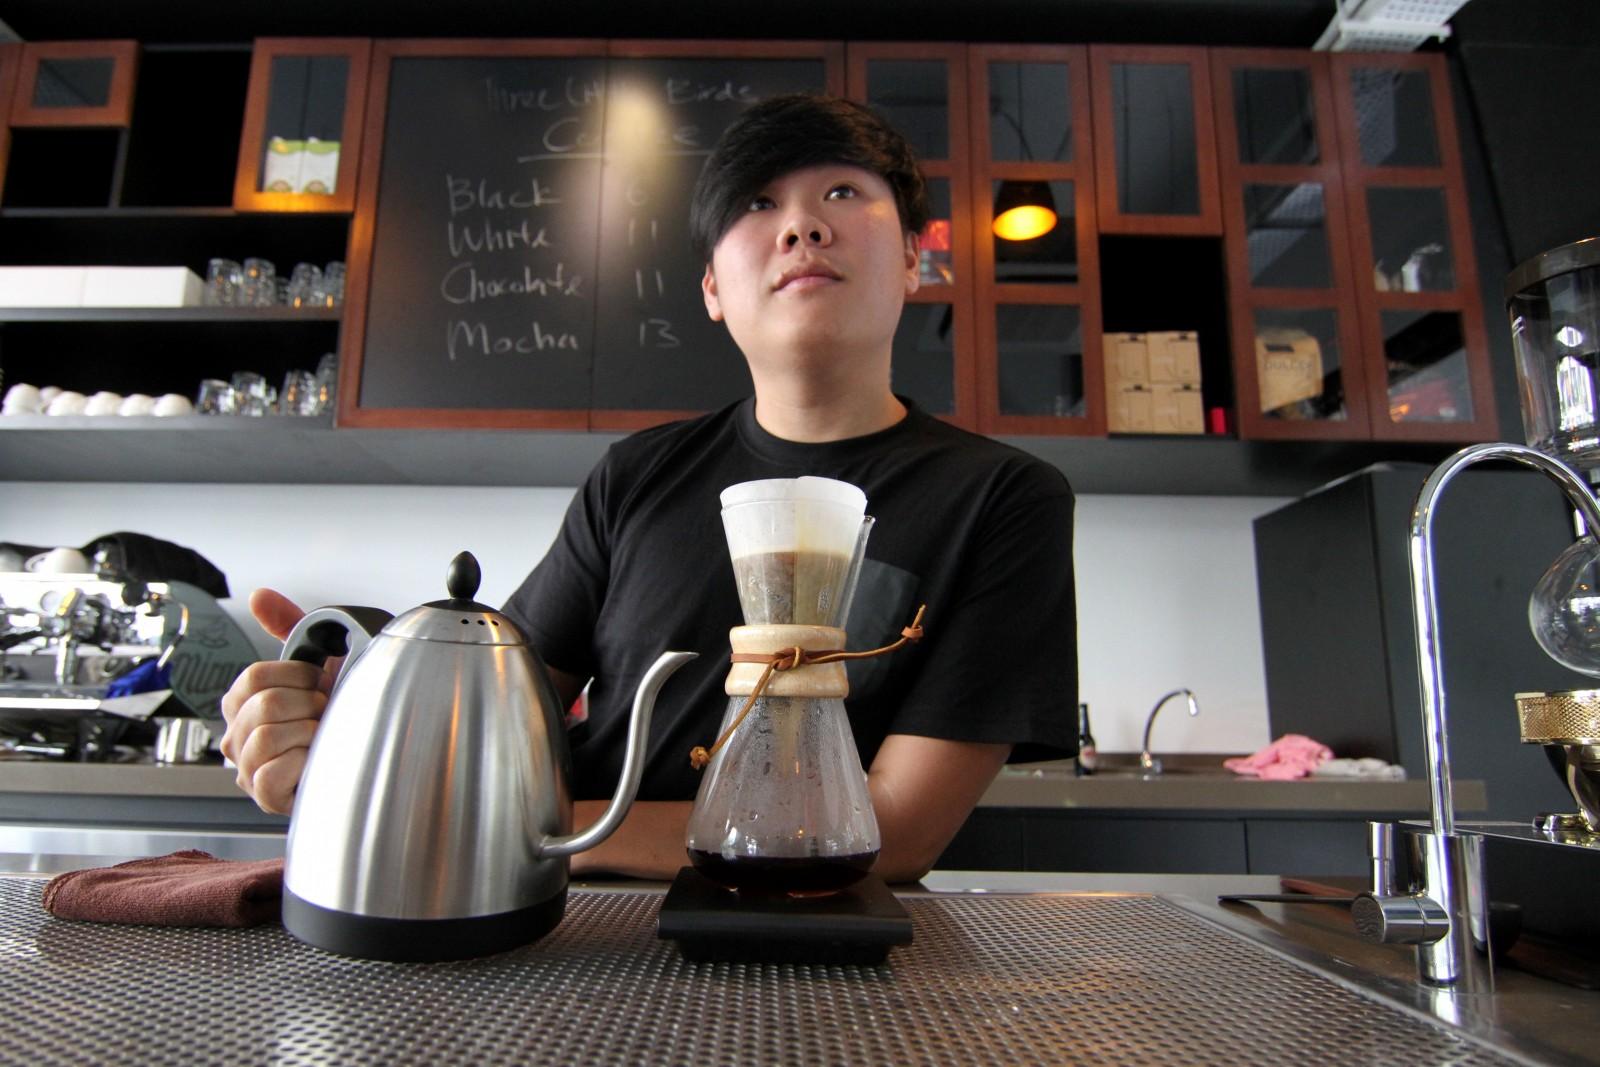 Coffee, Three Little Birds, Joey Mah, Chong Ee, Filter,